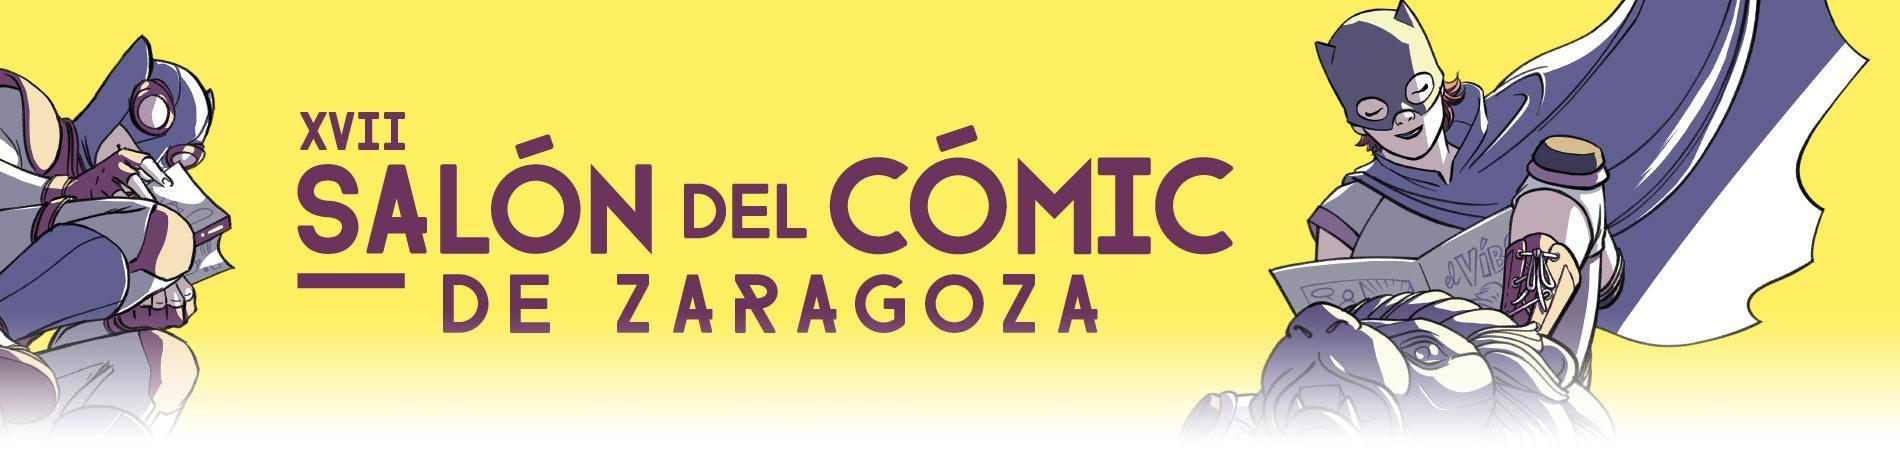 cabecera-xvii-salon-comic